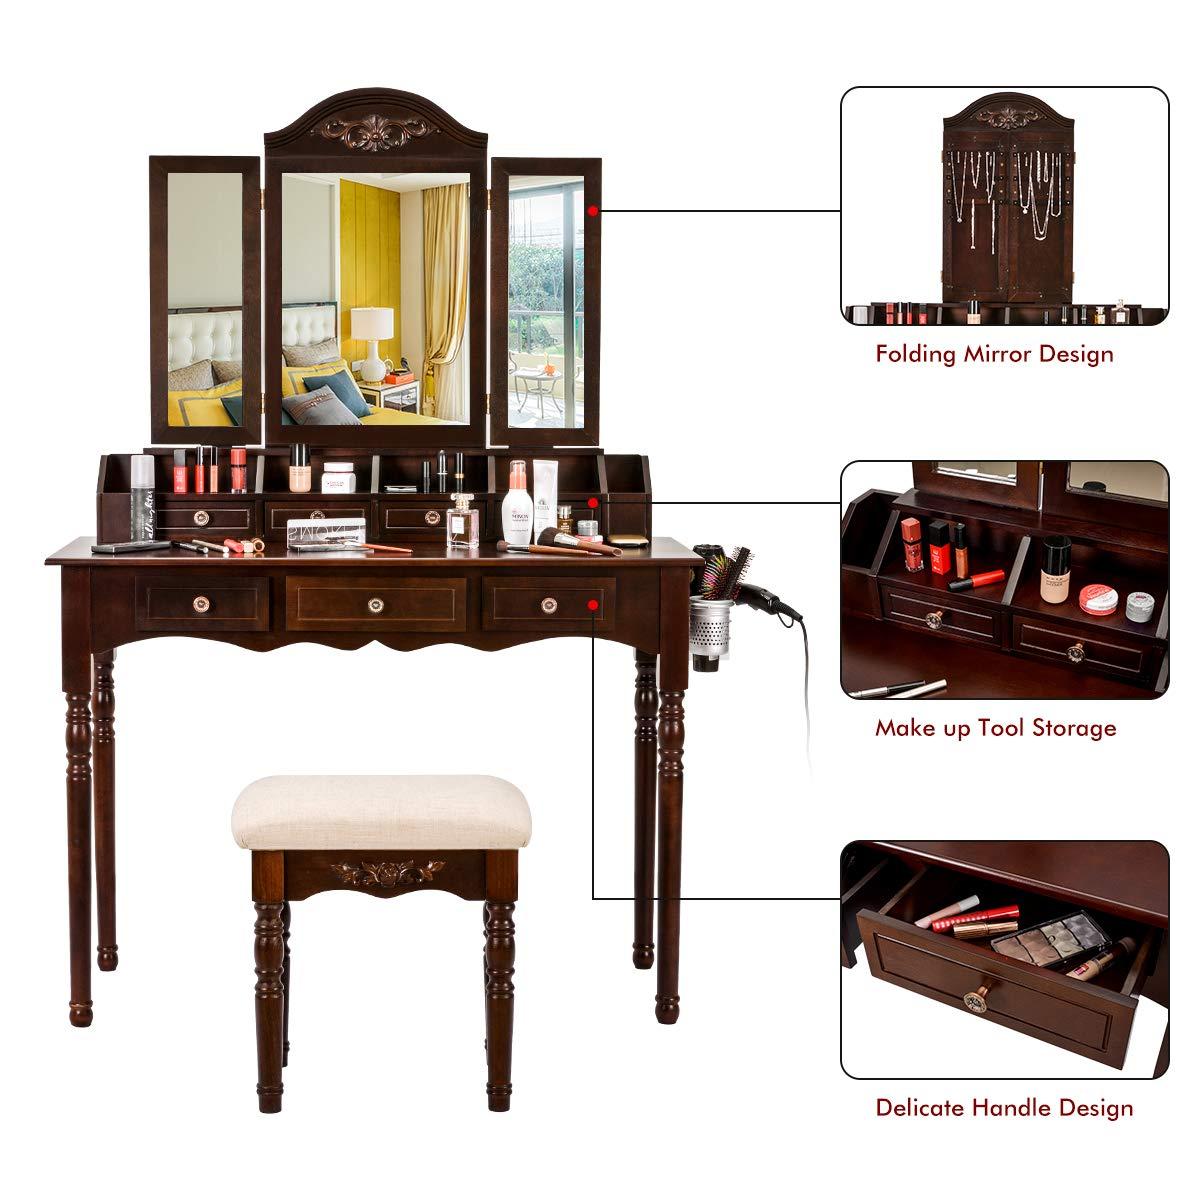 Superb Vanity Table Set Vanity Desk Dressing Makeup Table Tri Folding Mirror Cushioned Stool 7 Drawers Desk Organizer Brown Interior Design Ideas Skatsoteloinfo